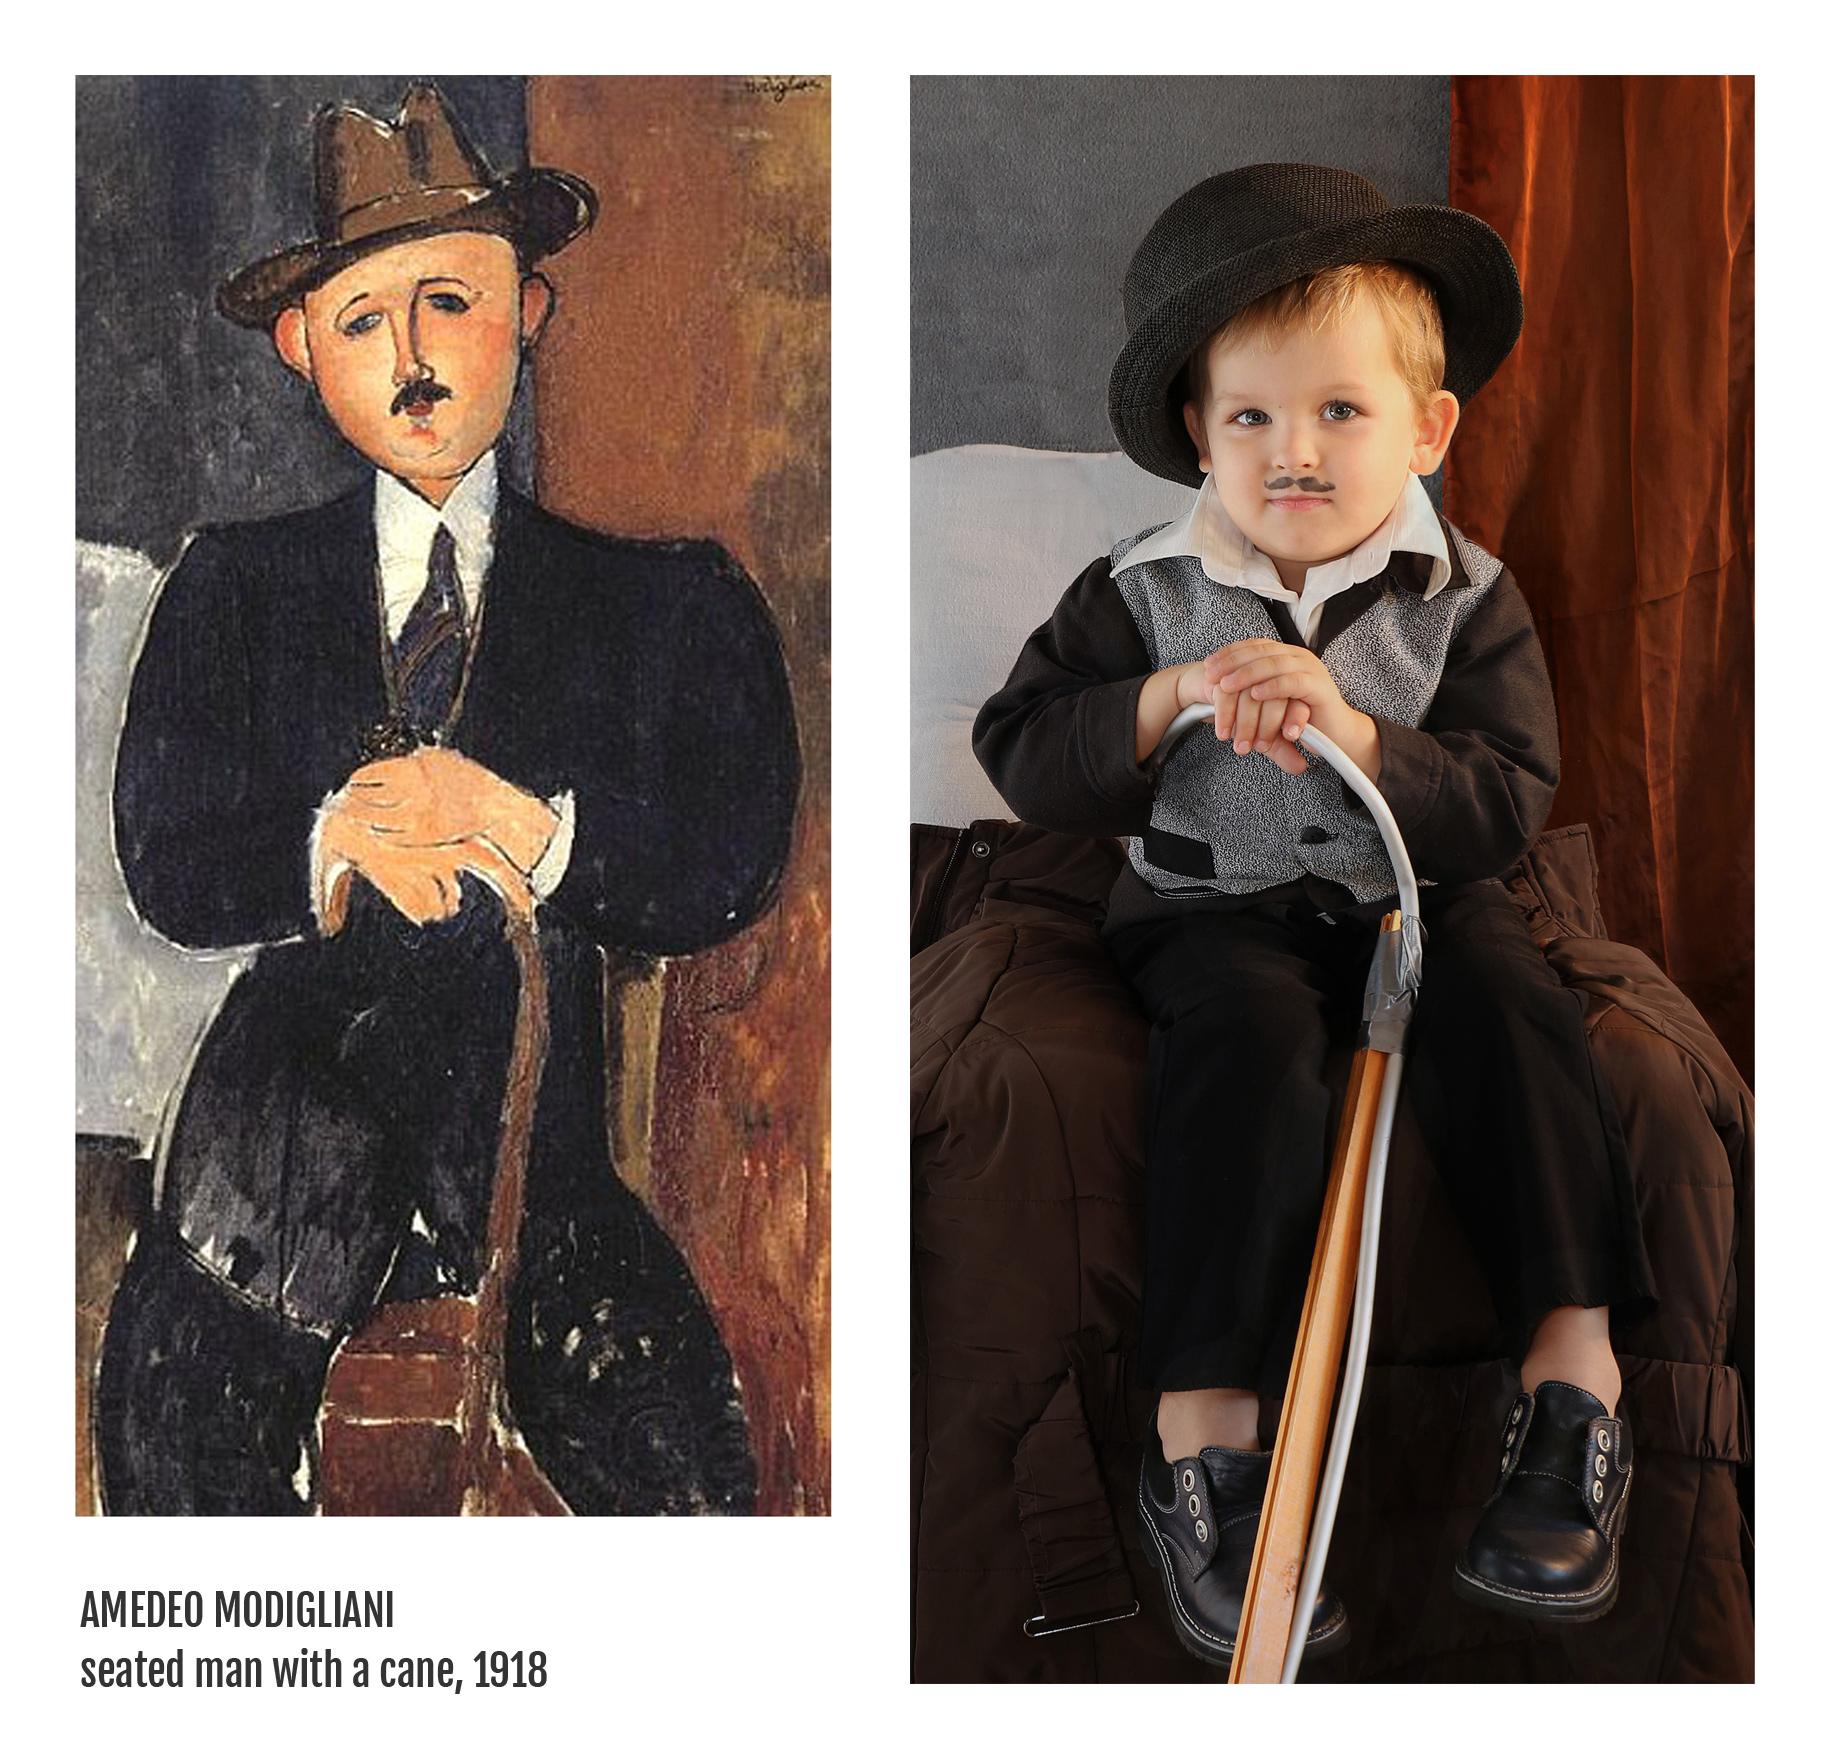 Amedeo Modigliani - seated man with a cane